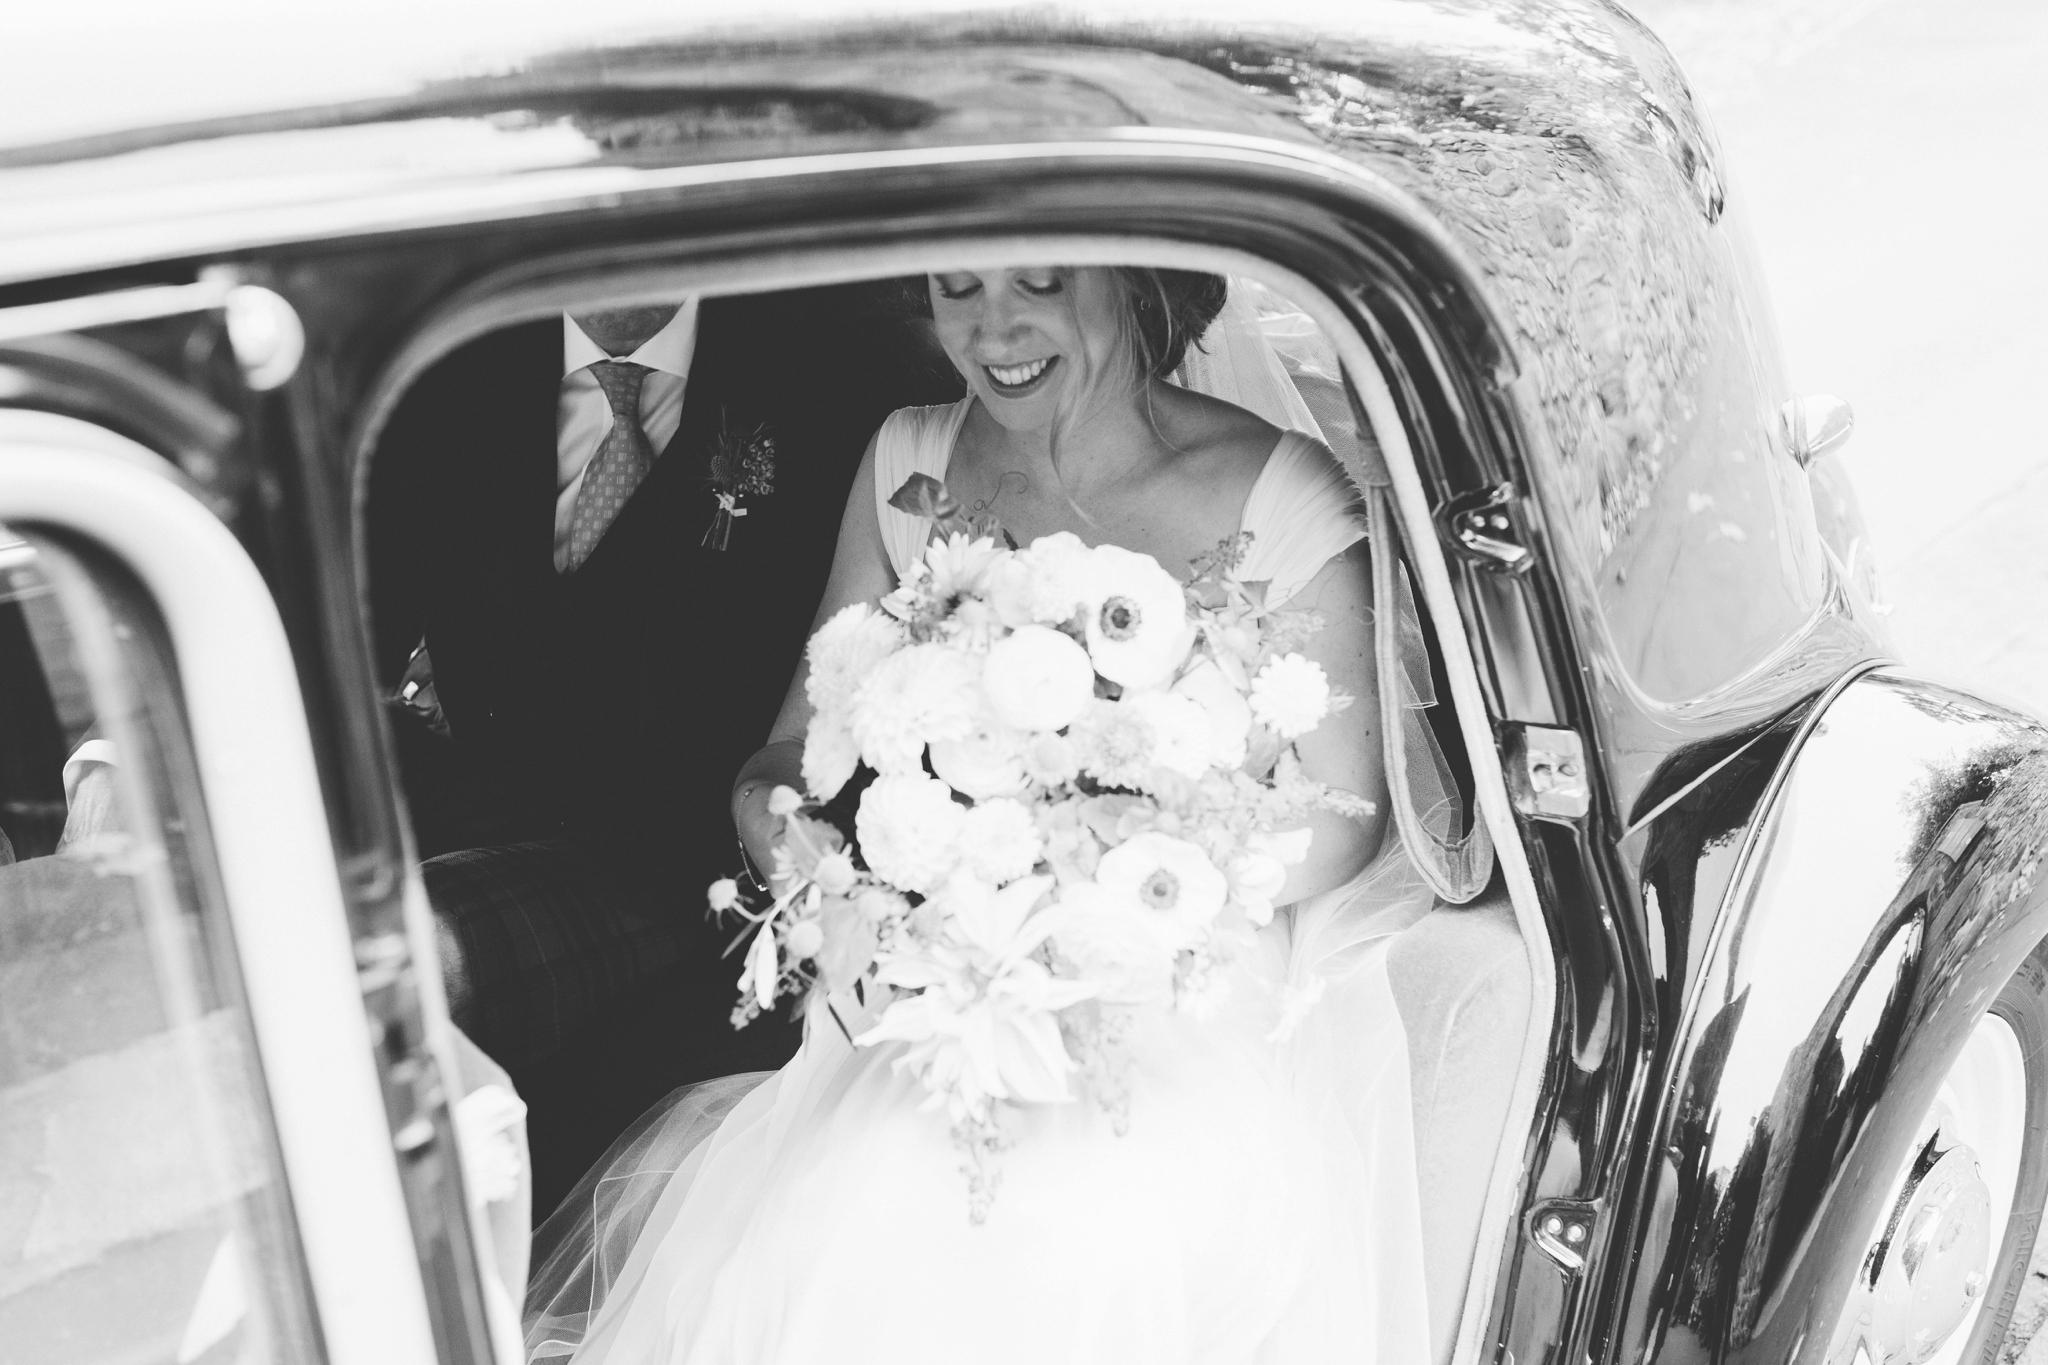 Suzanne_li_photography_kirknewton_wedding_0043.jpg